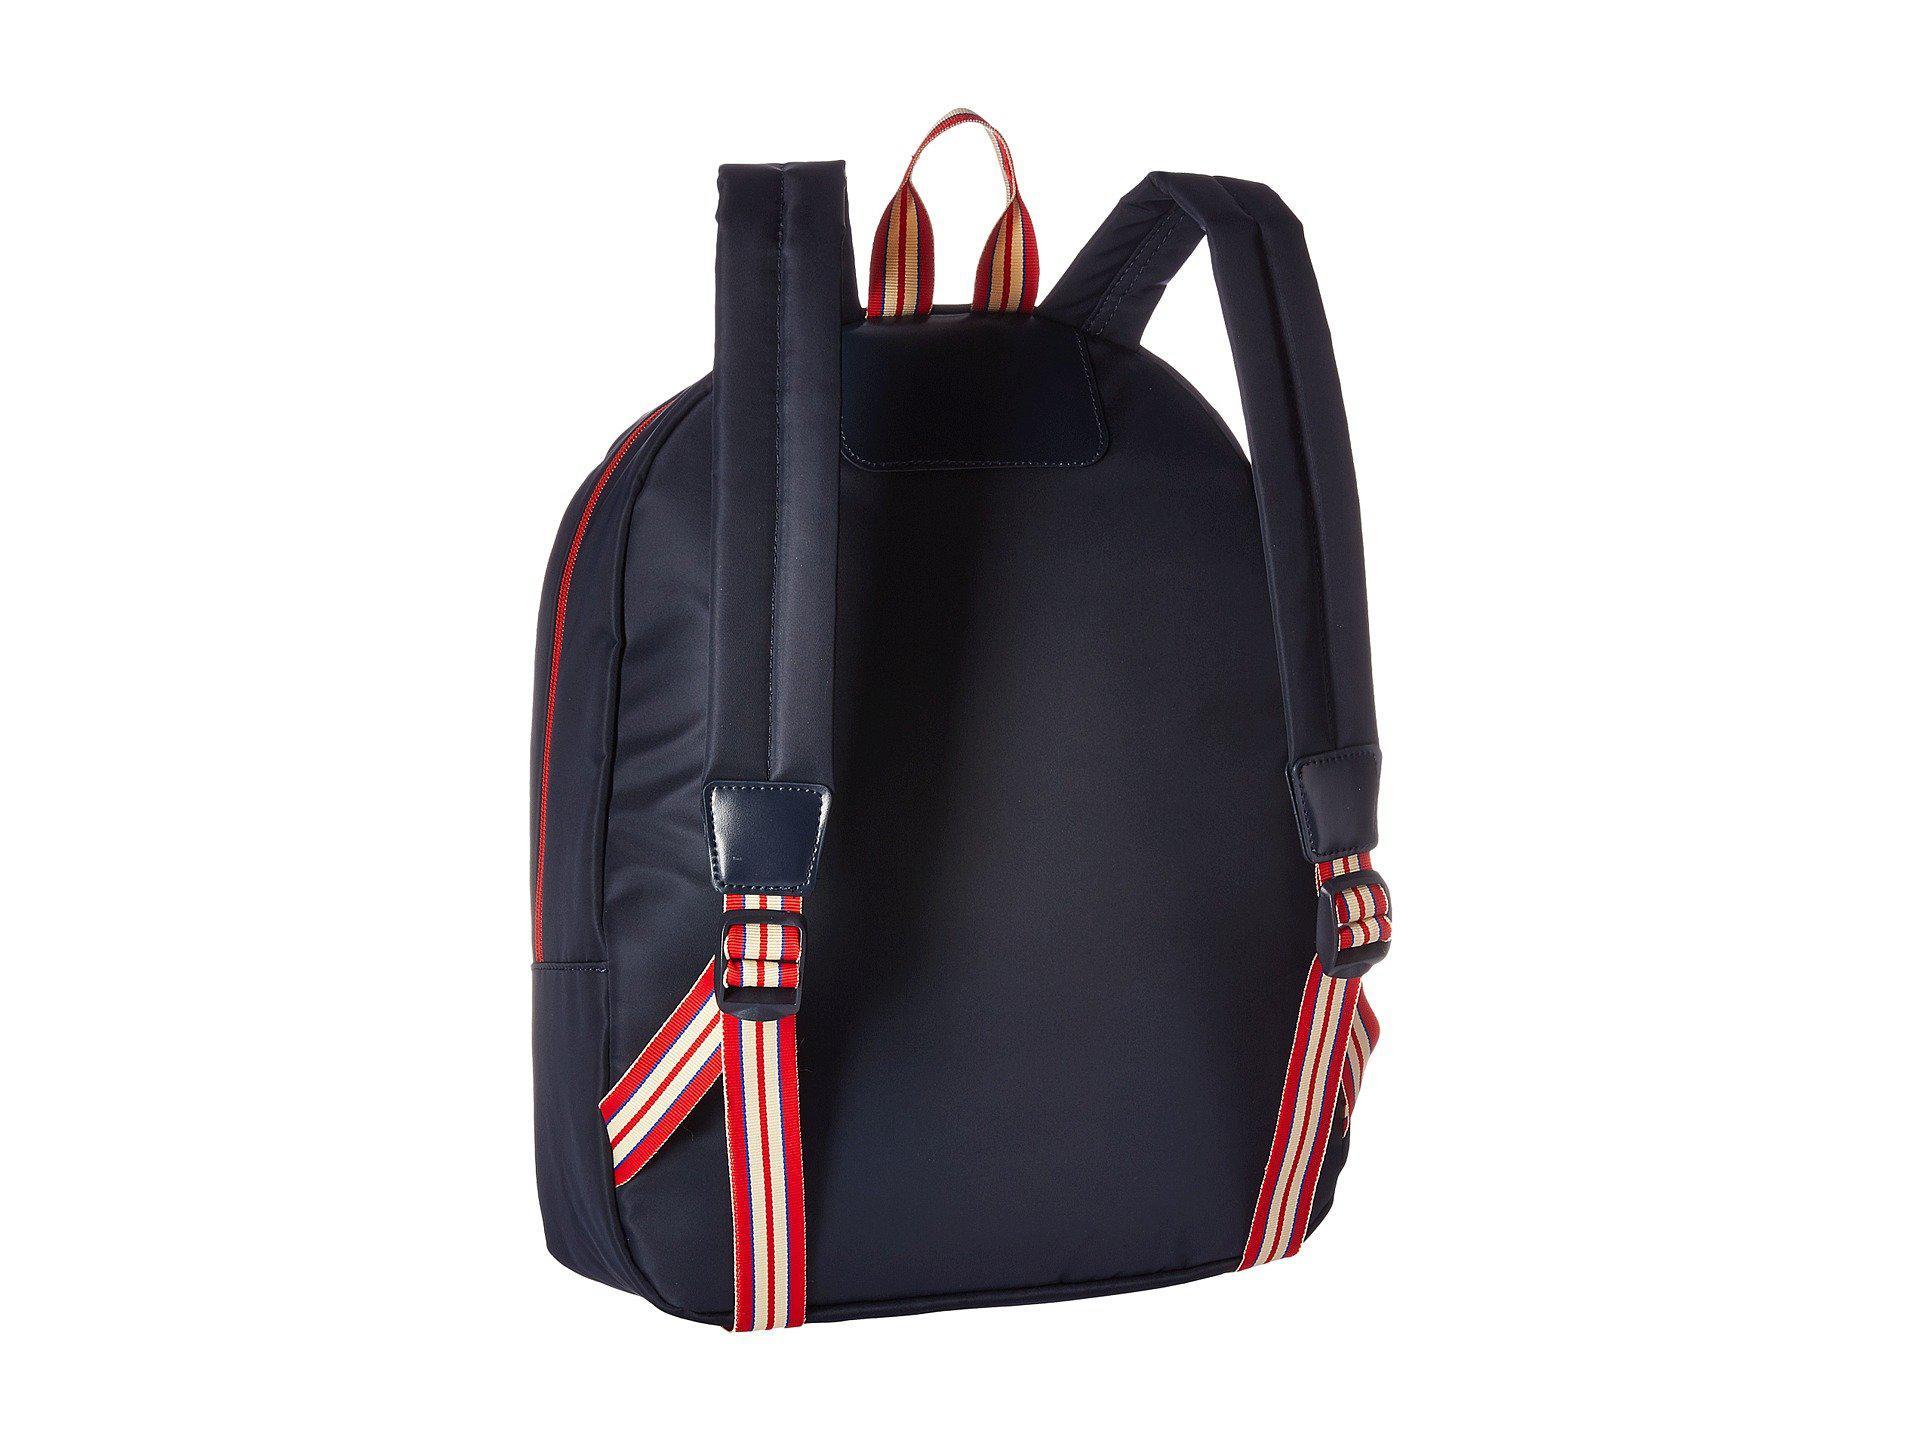 Lyst - Lipault Ines De La Fressange Medium Backpack (blue) Backpack ... a00e14454e3a4